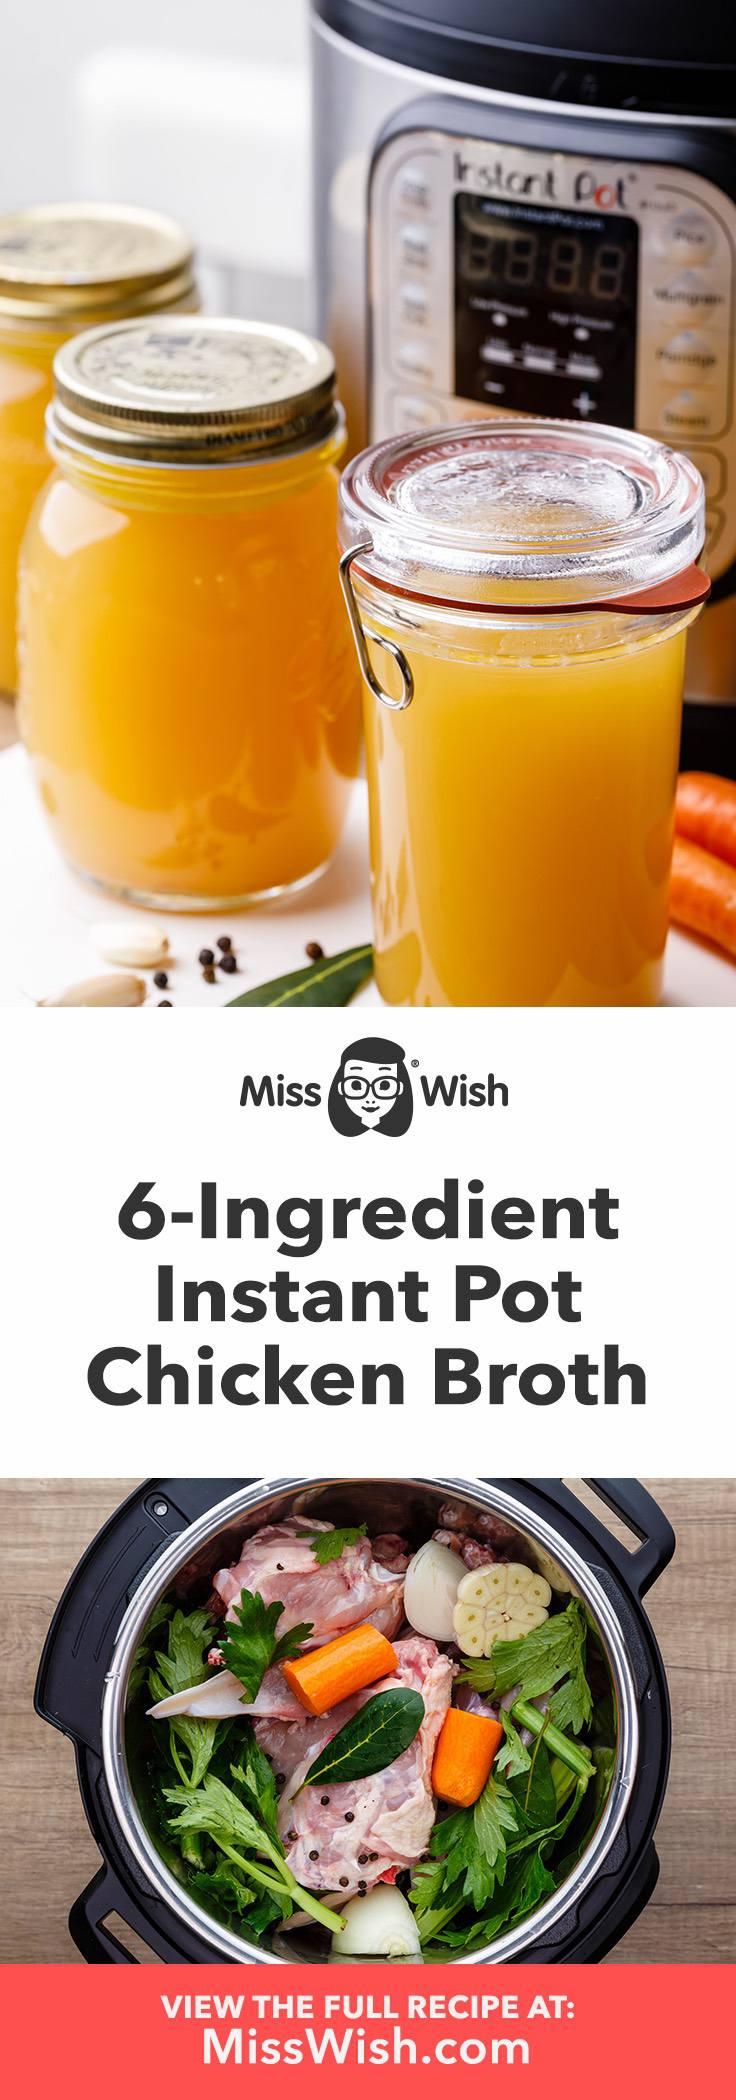 6-Ingredient Instant Pot Chicken Broth from Scratch